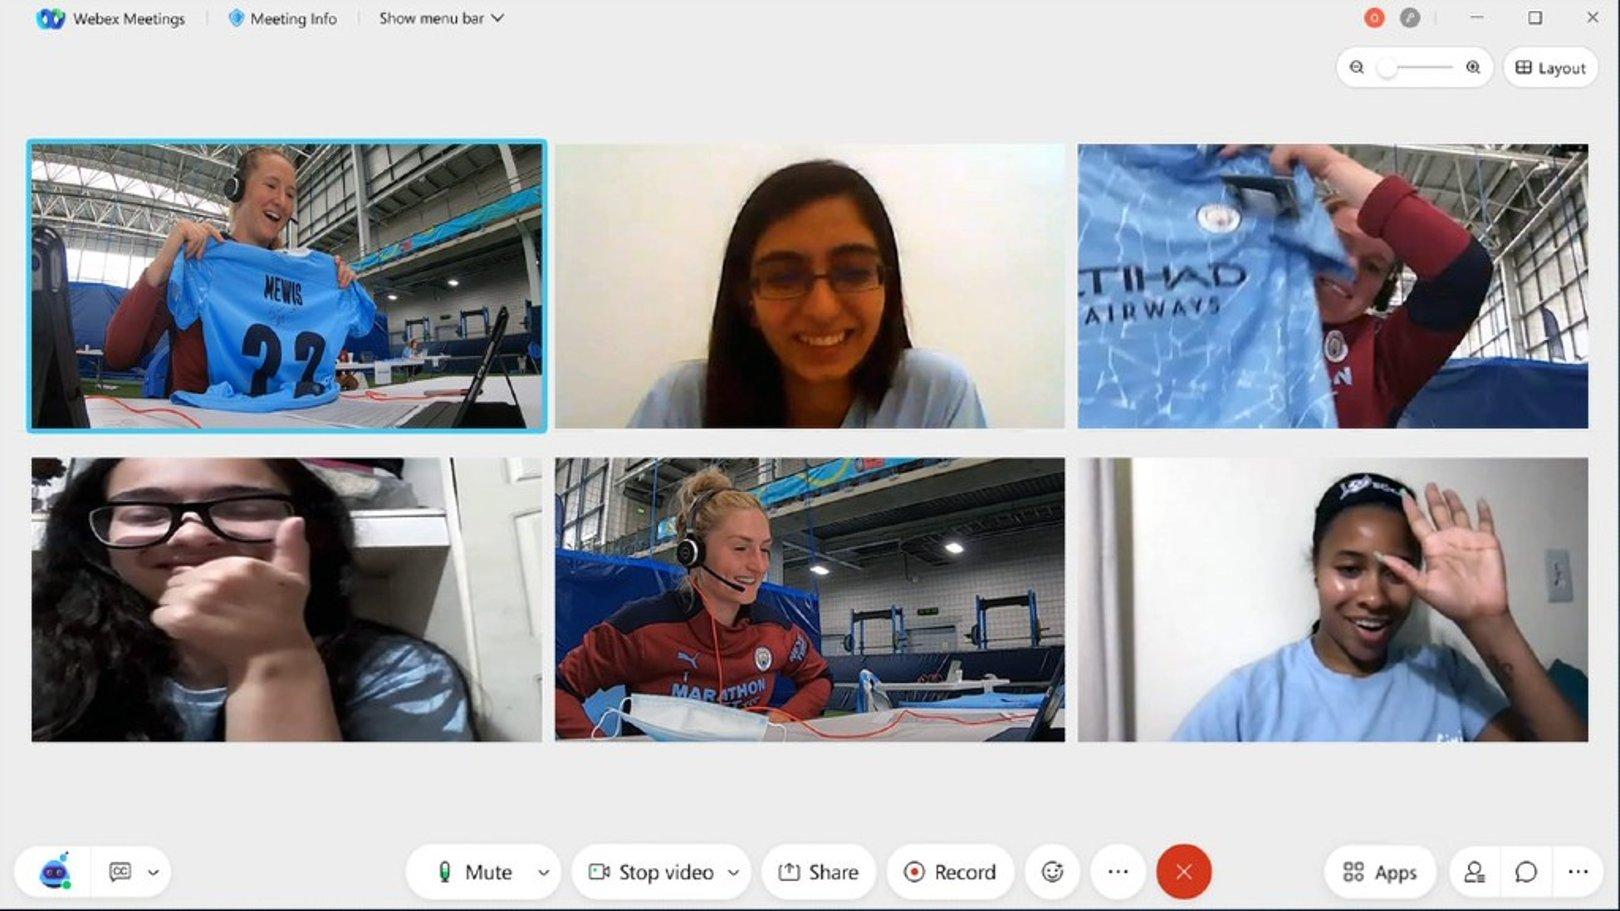 Para Young Leader Terhubung Dengan Bintang City Melalui Webex by Cisco